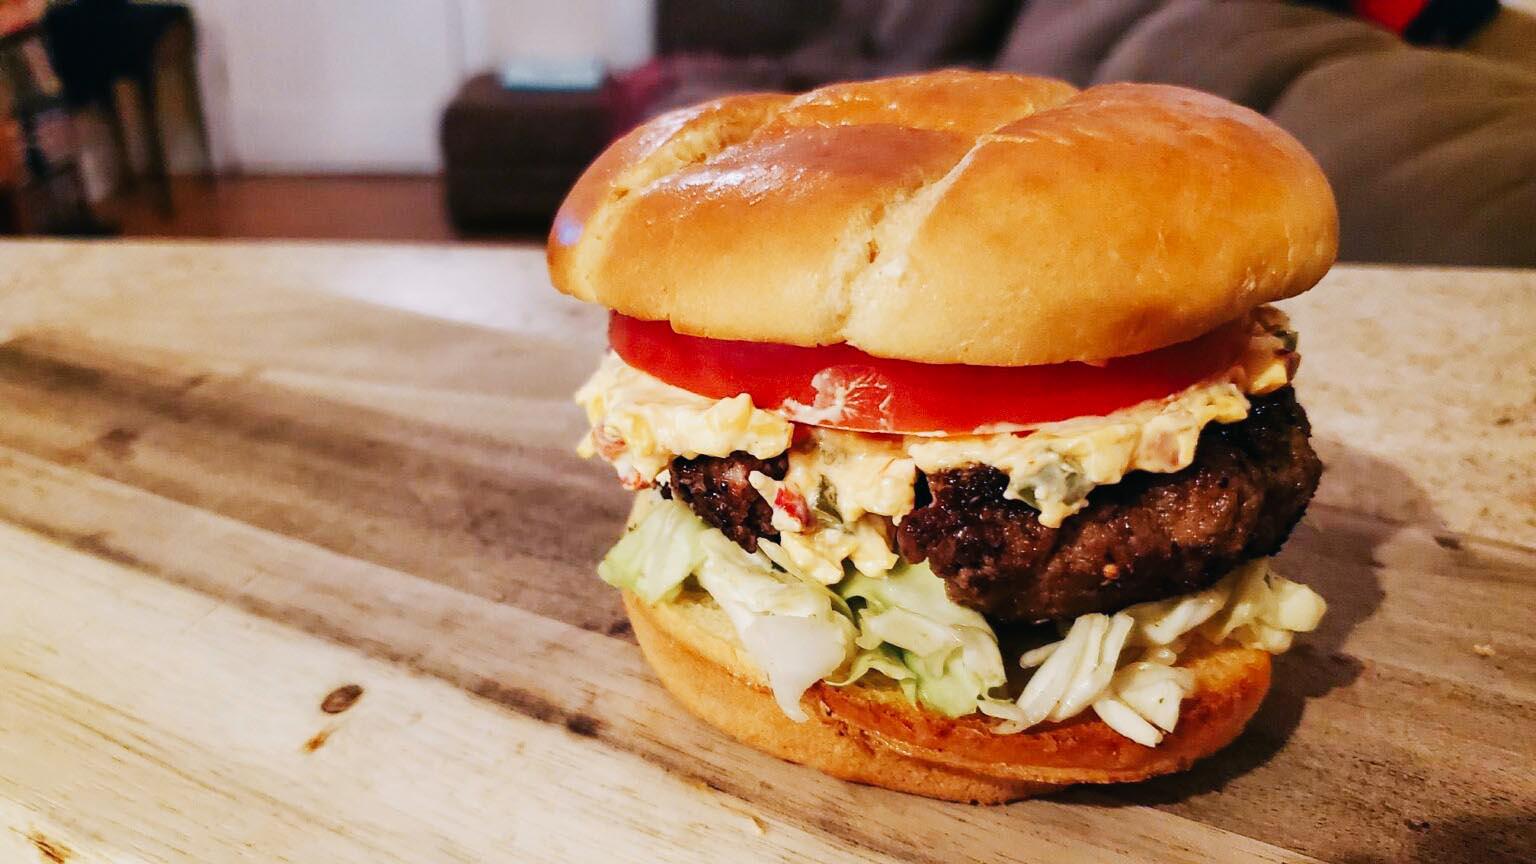 How to make pimento cheeseburgers